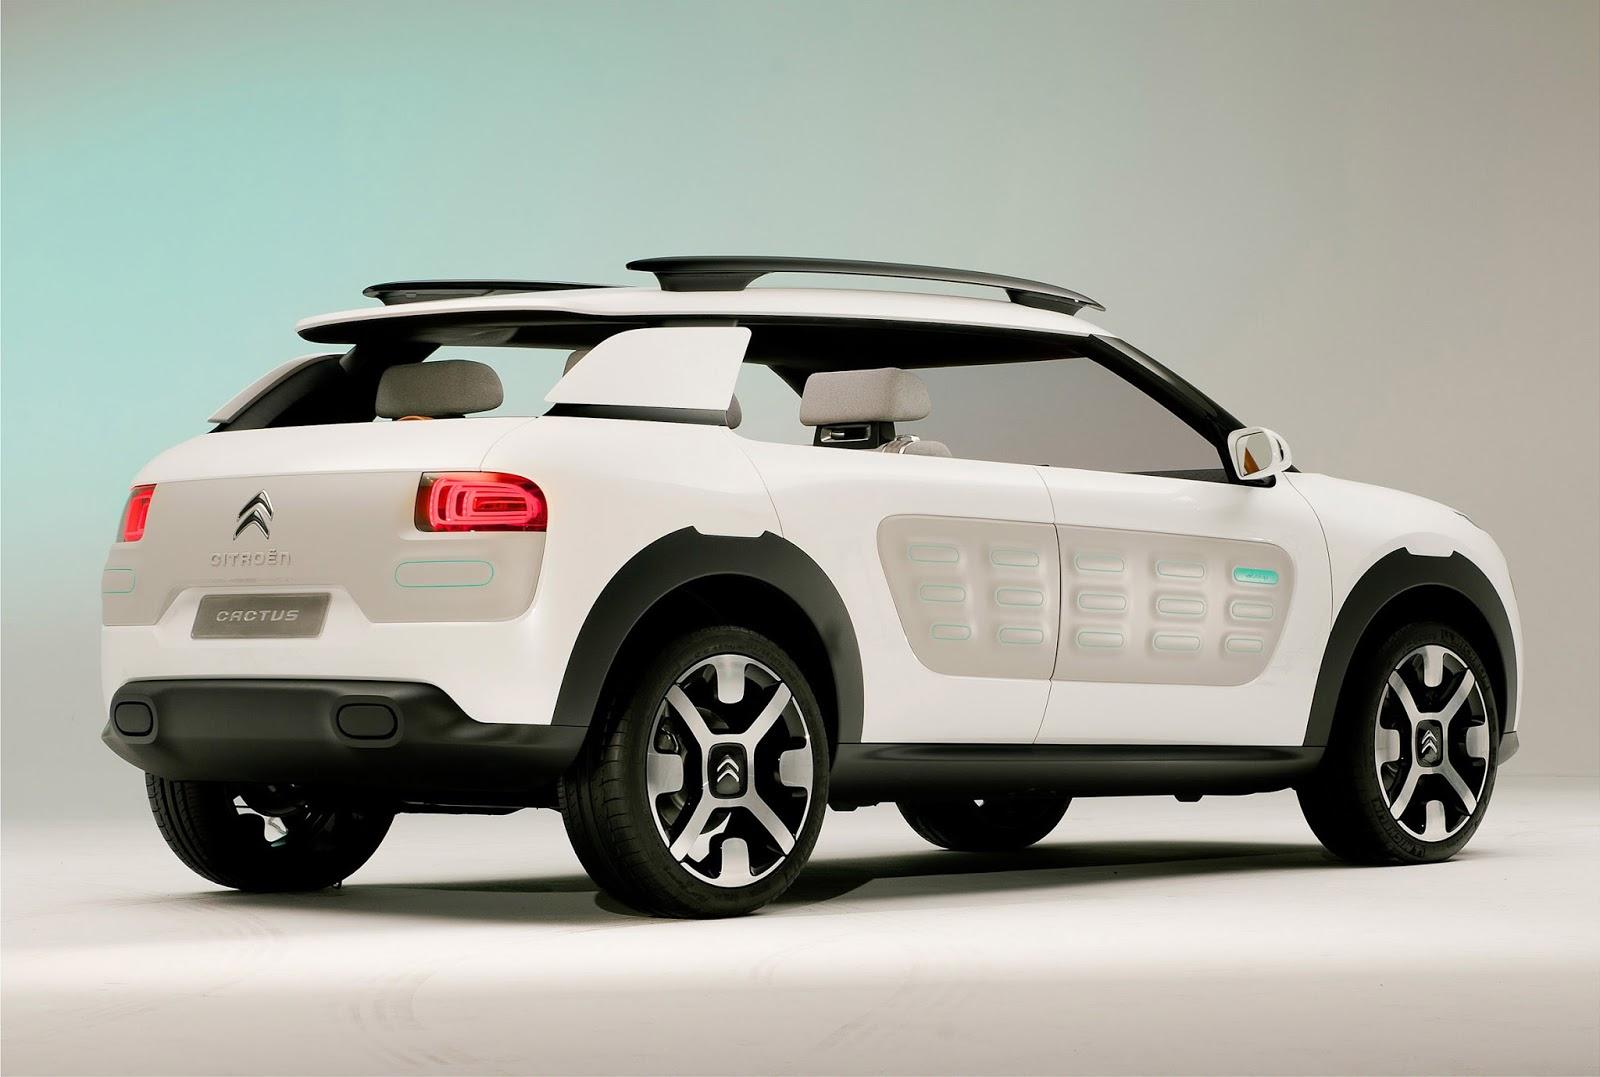 Citroen Cactus Concept 2013 Hottest Car Wallpapers